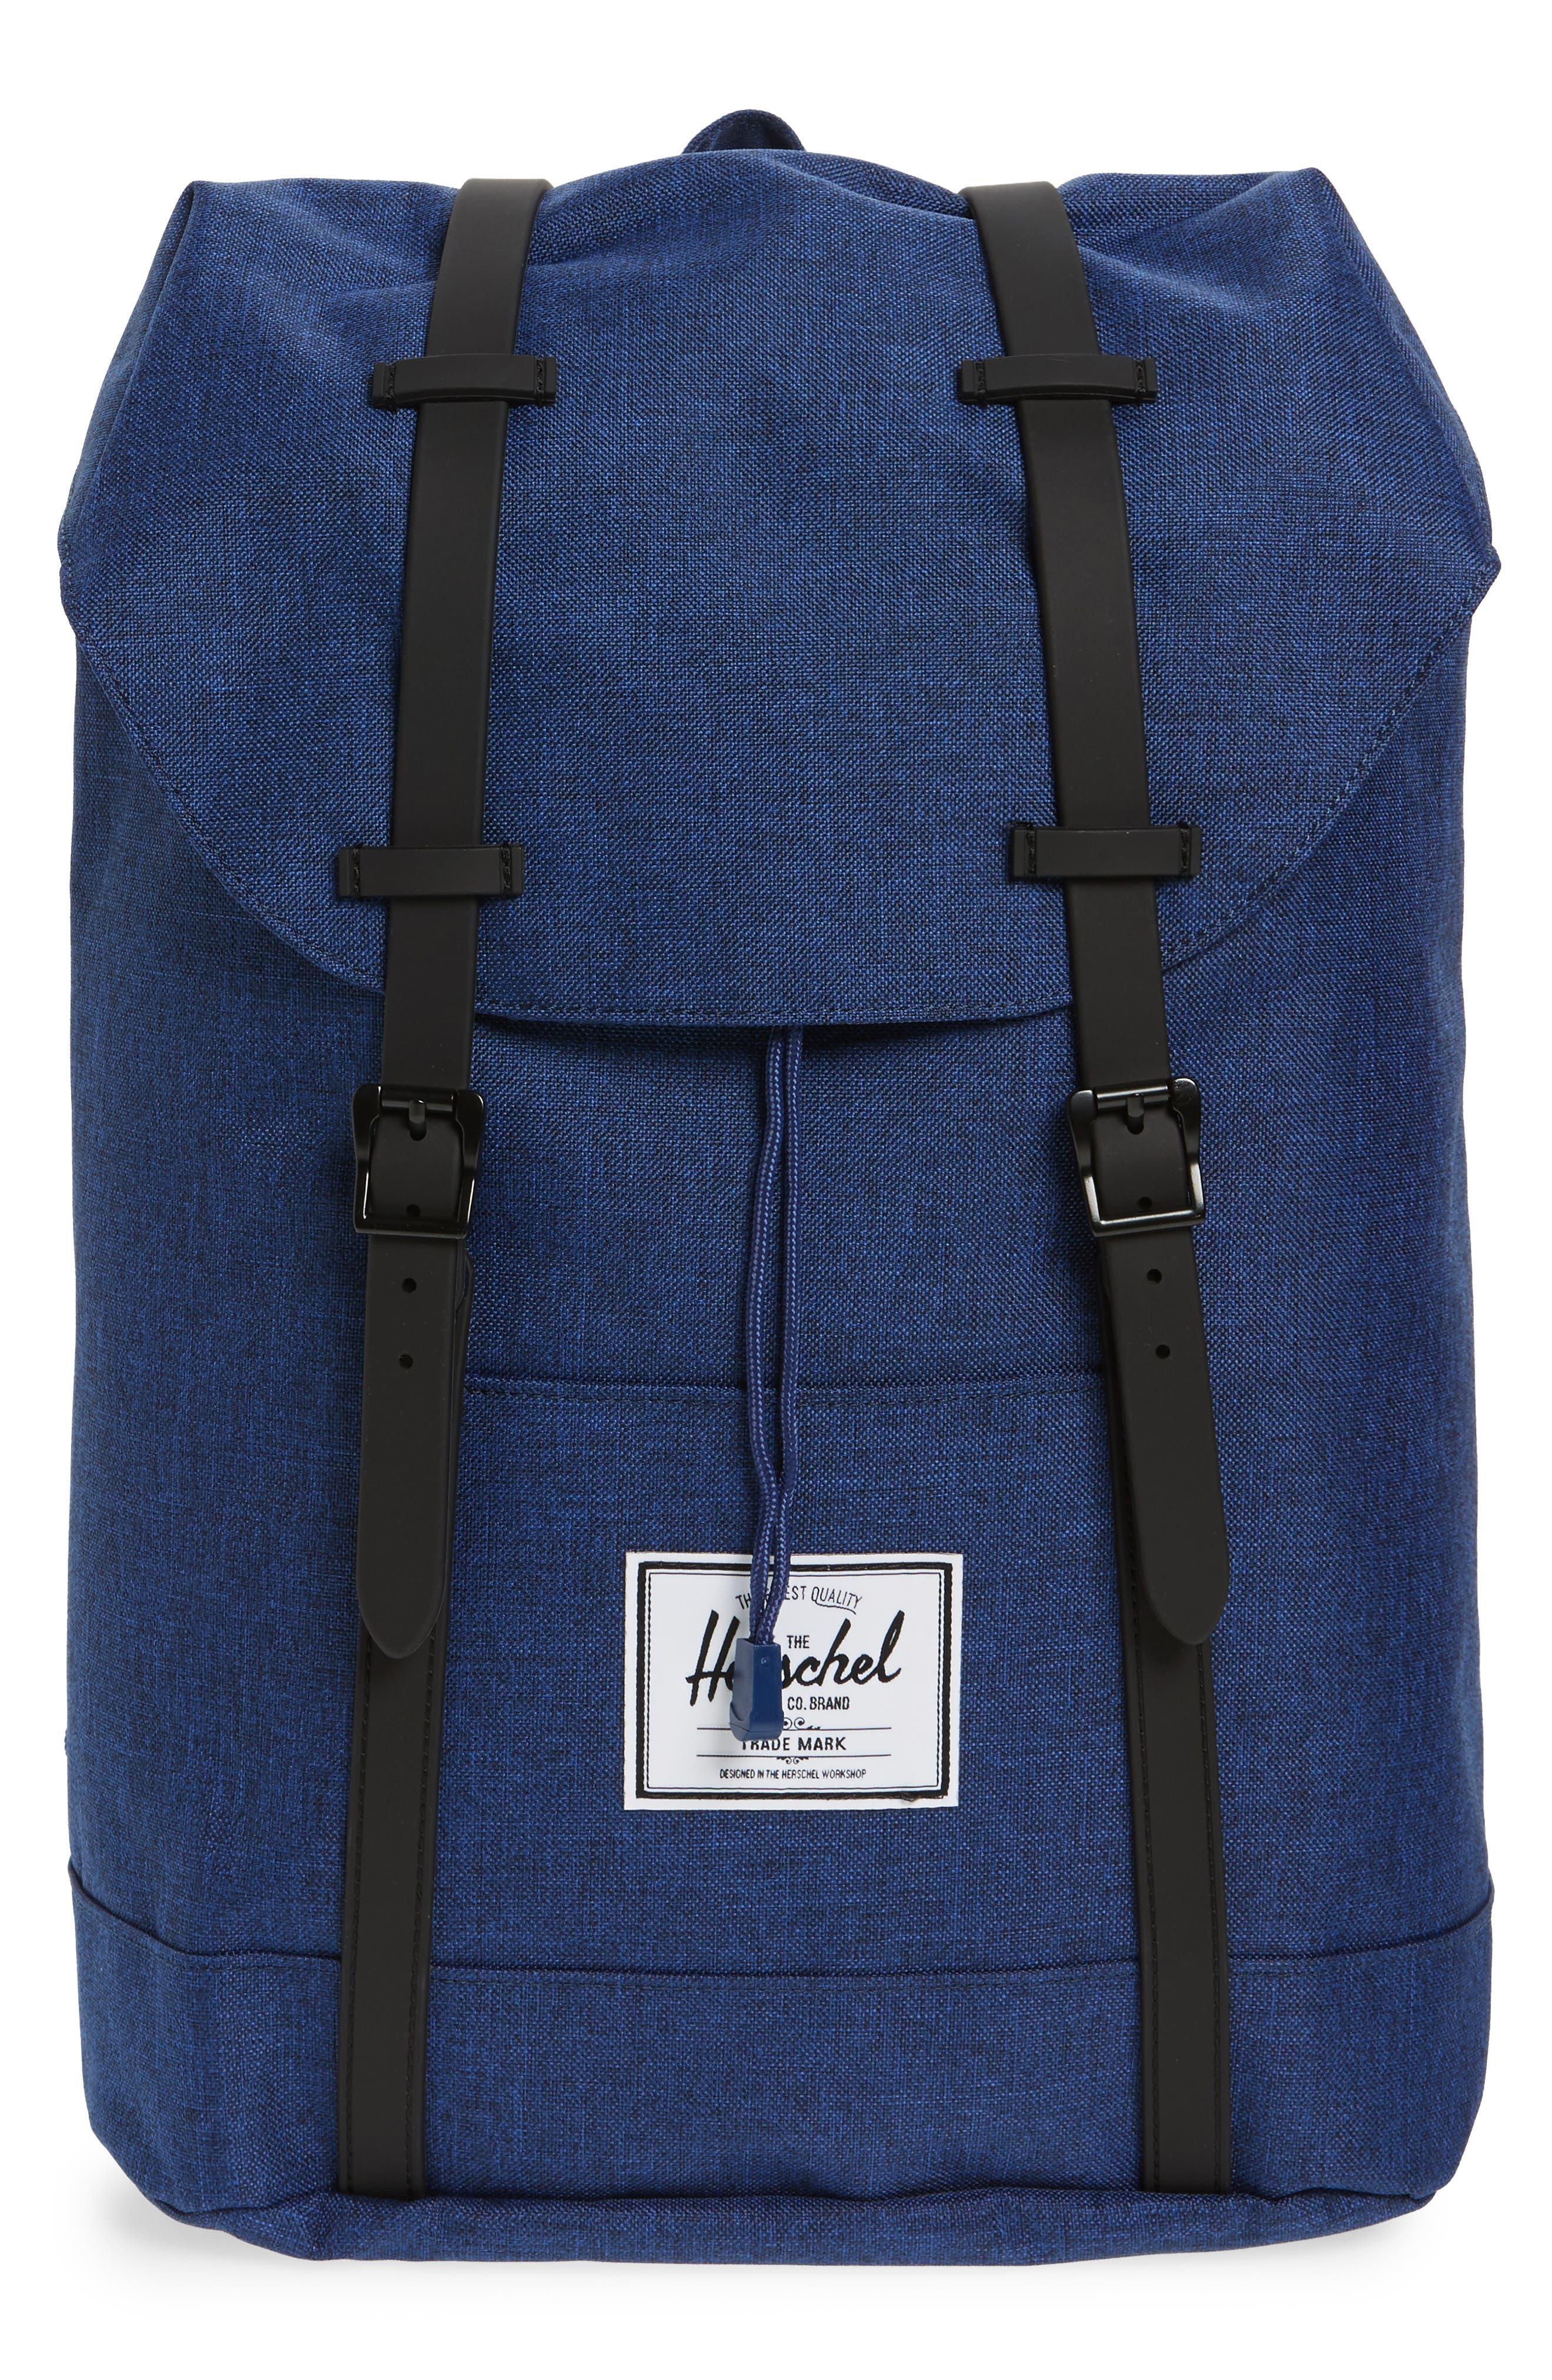 Retreat Backpack,                             Main thumbnail 1, color,                             091